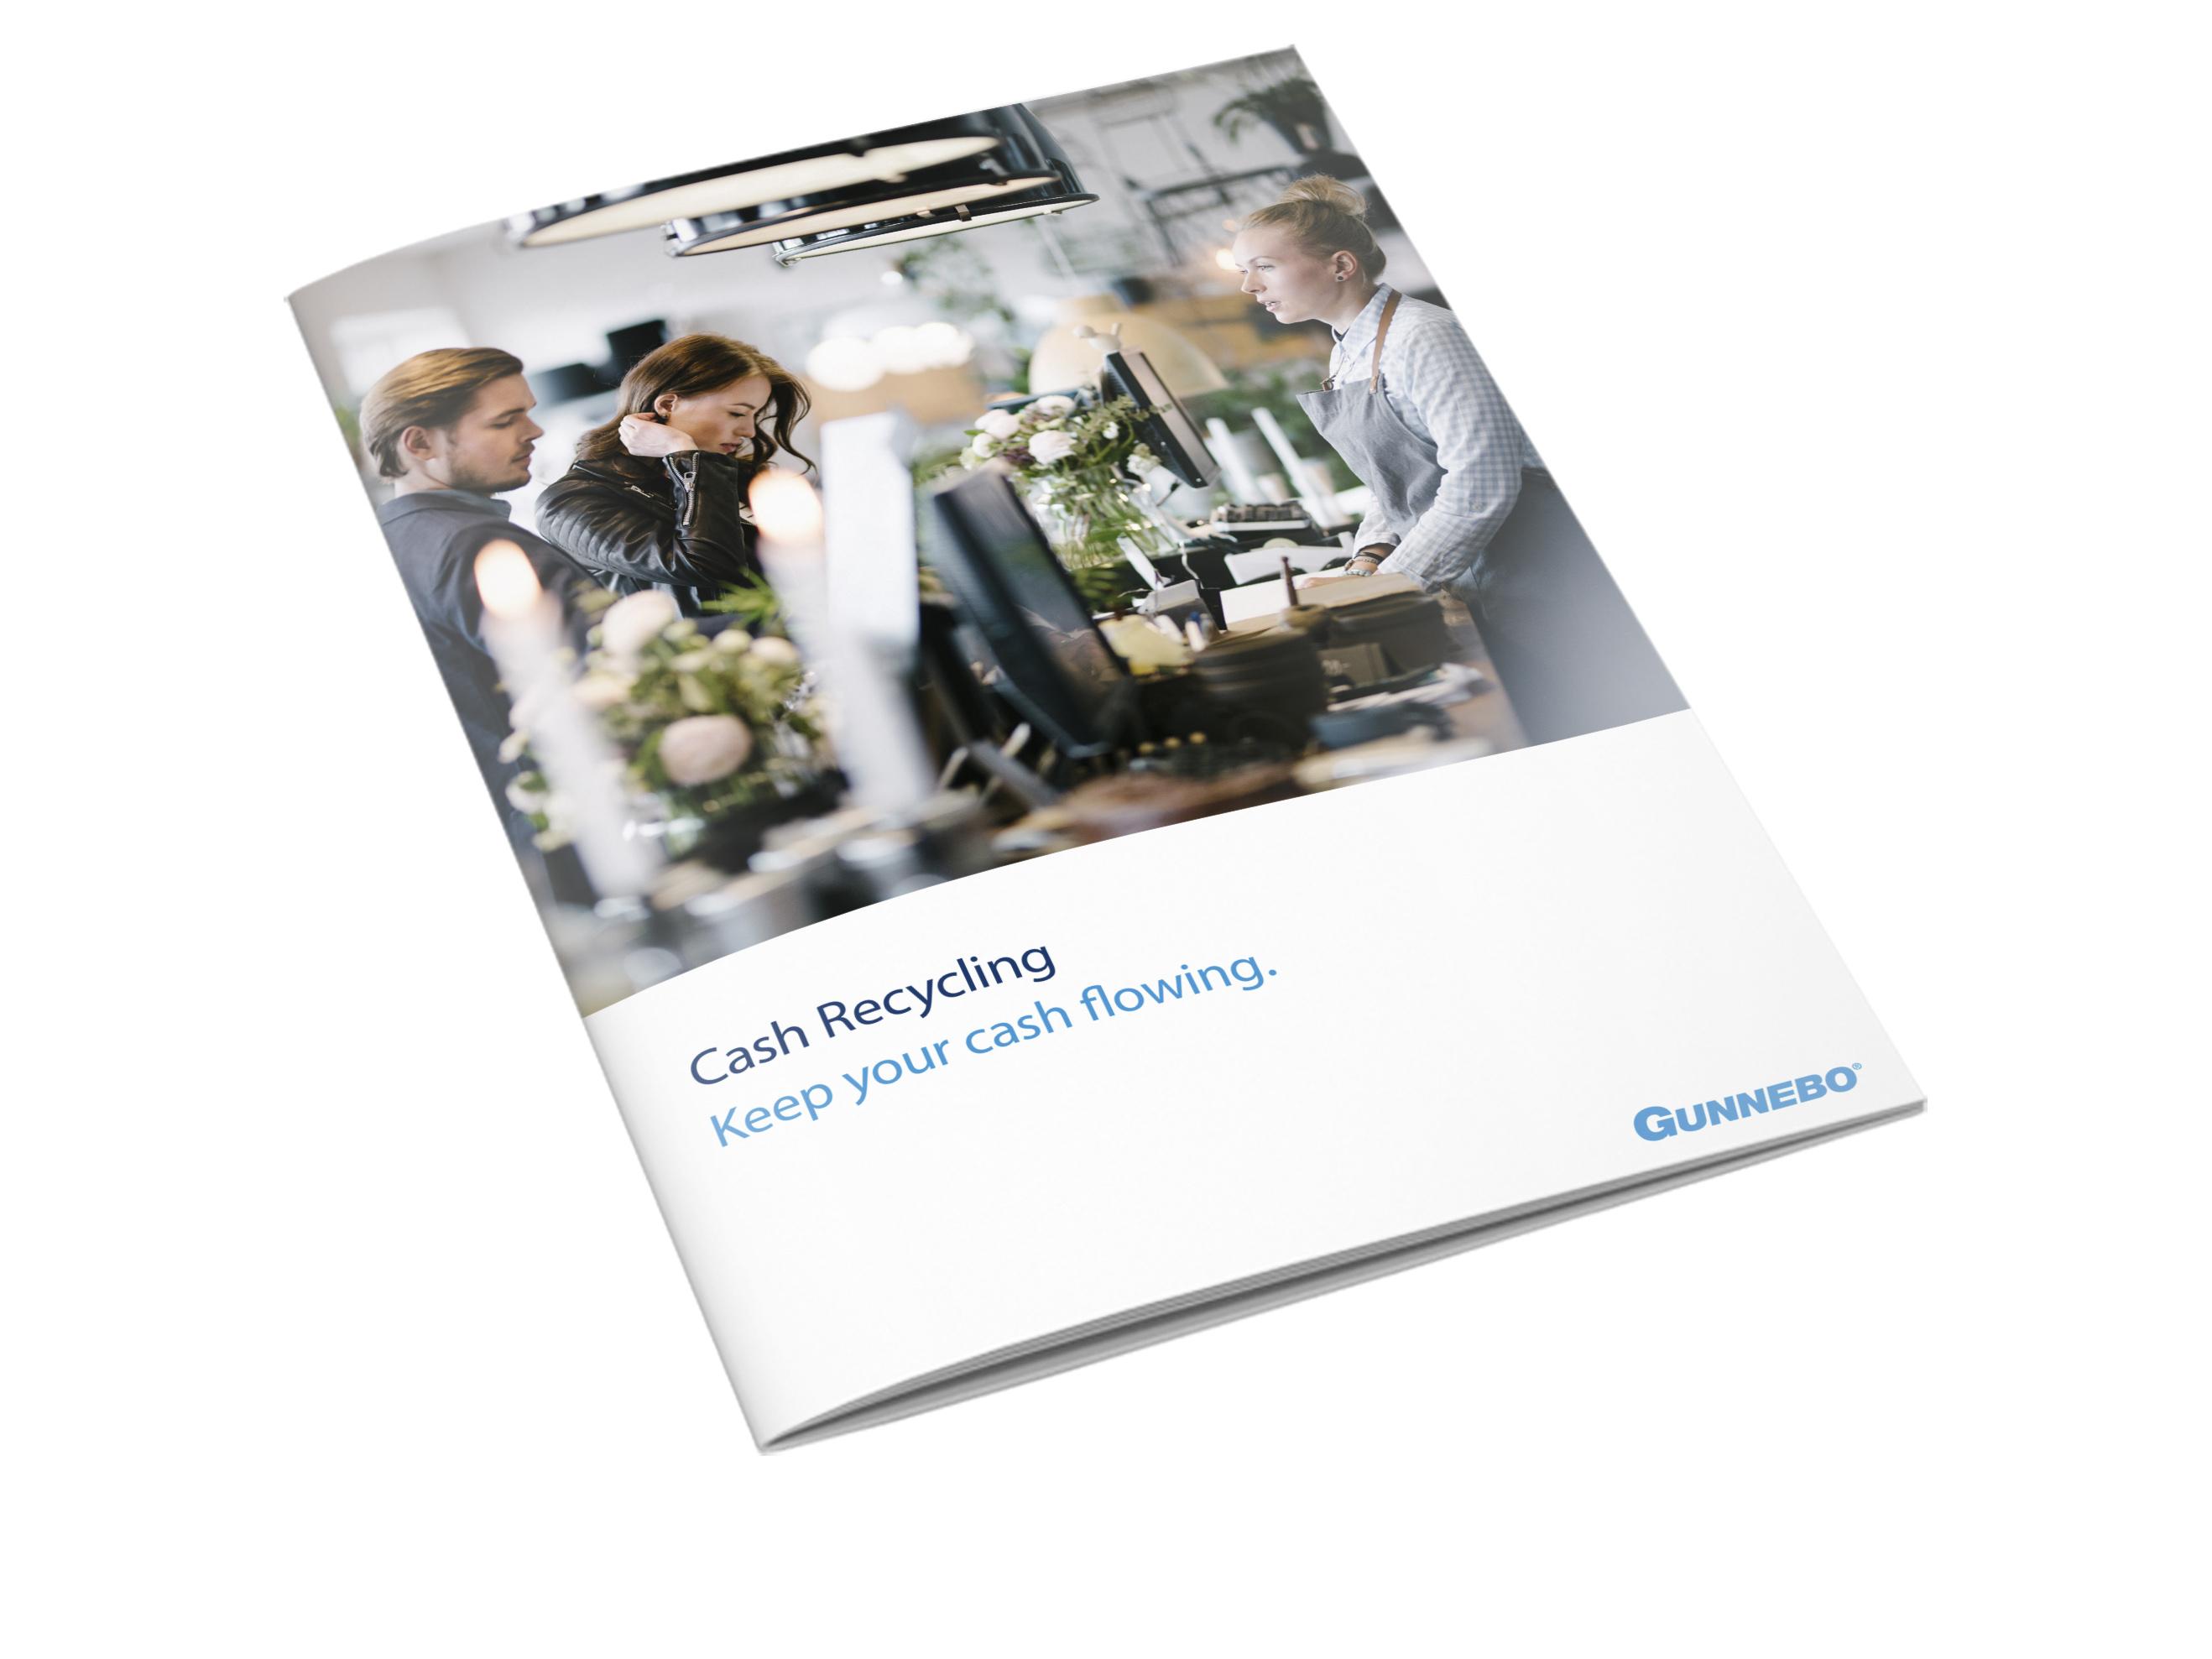 cash recycling brochure